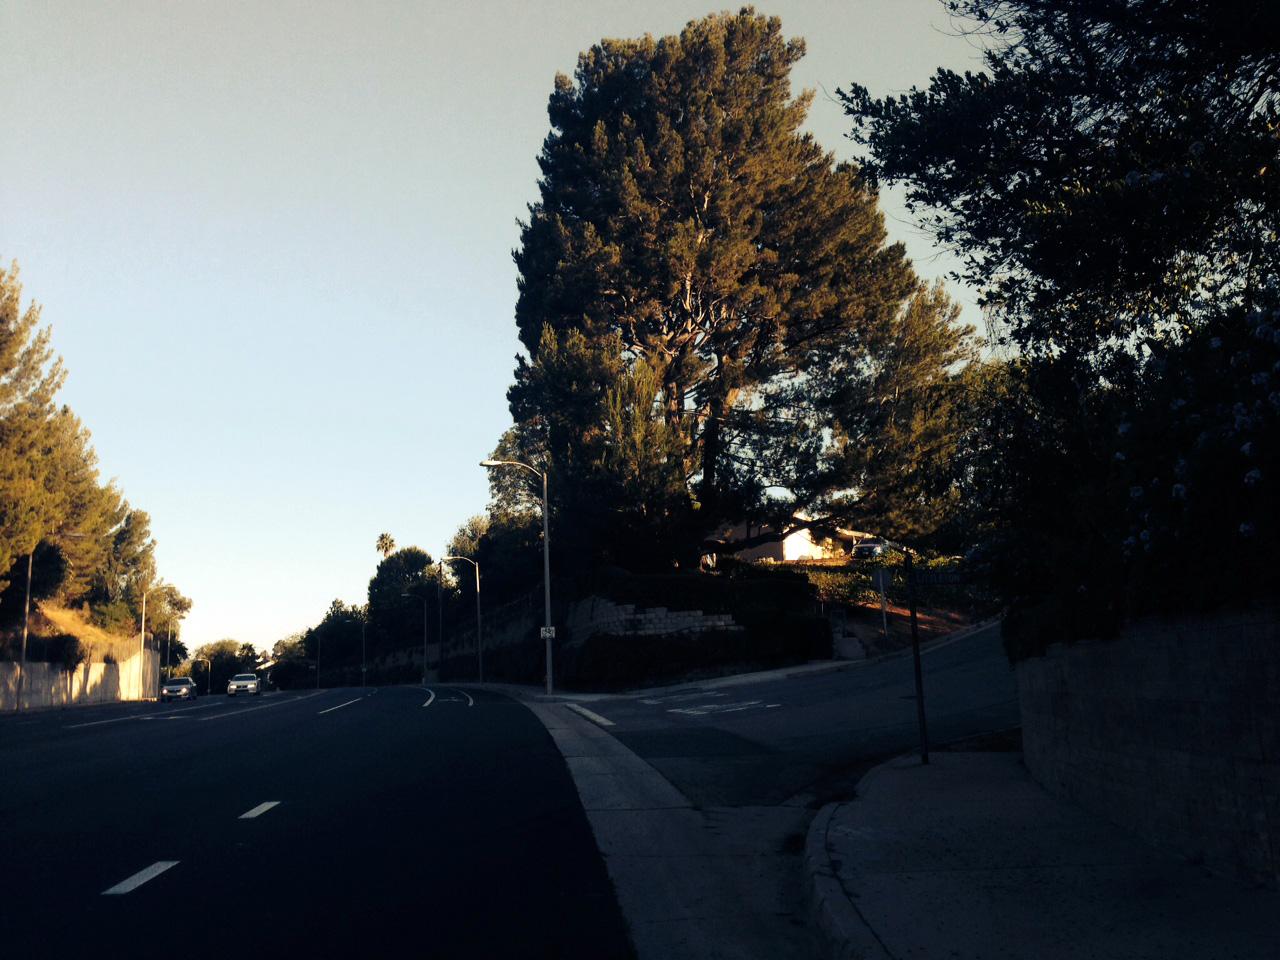 Road with bike lane.